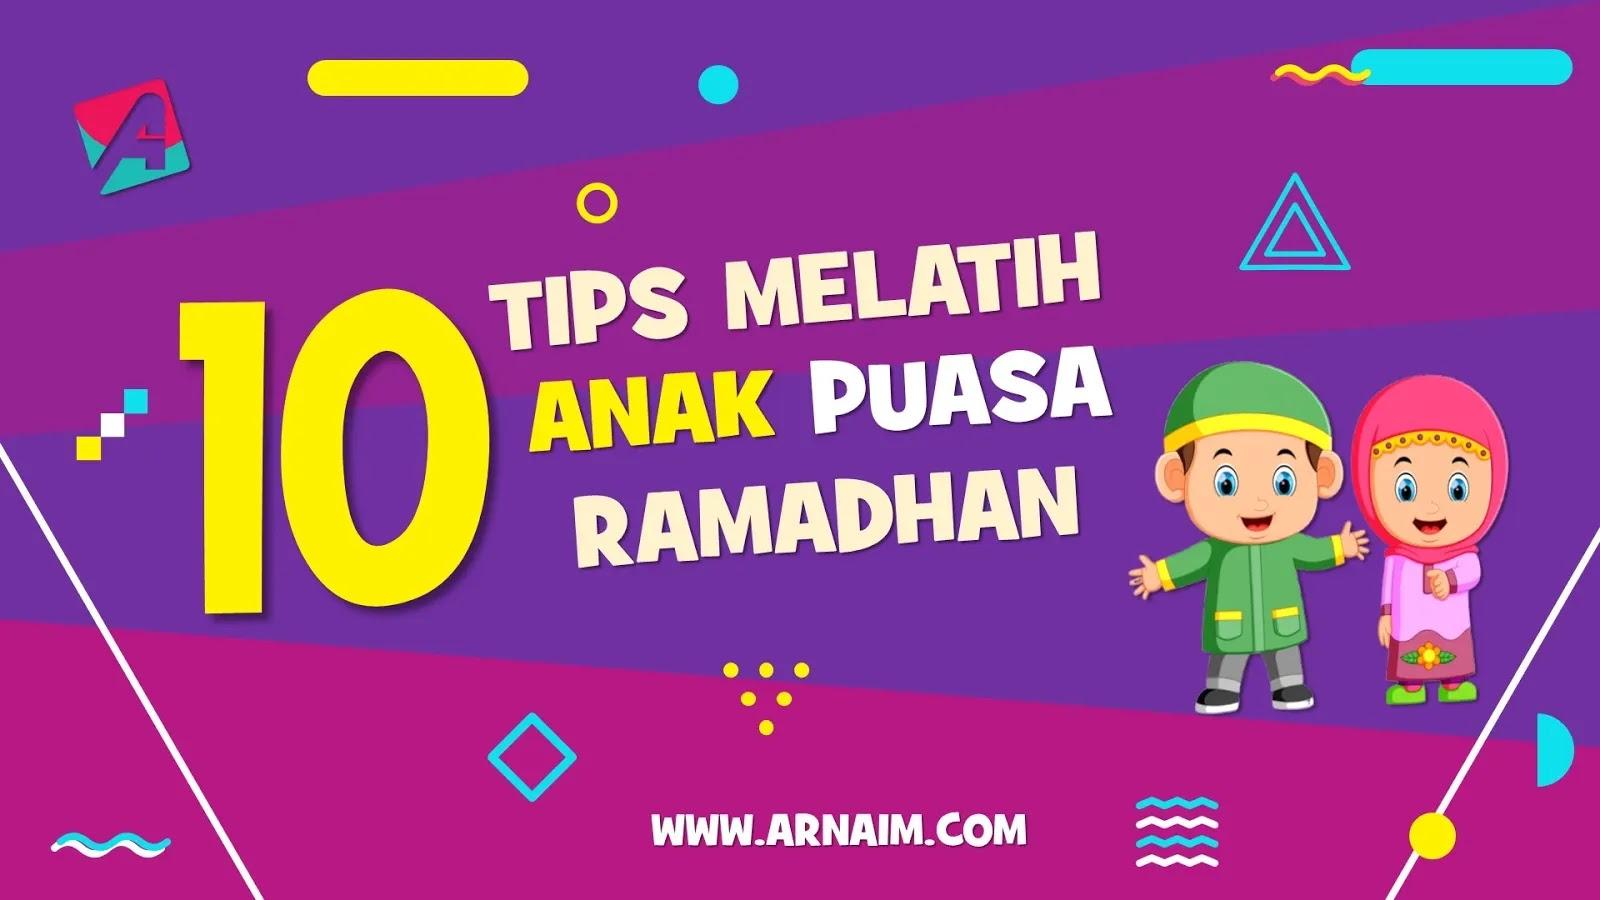 Arnaim.com - 10 Tips Melatih Anak Puasa Ramdahan